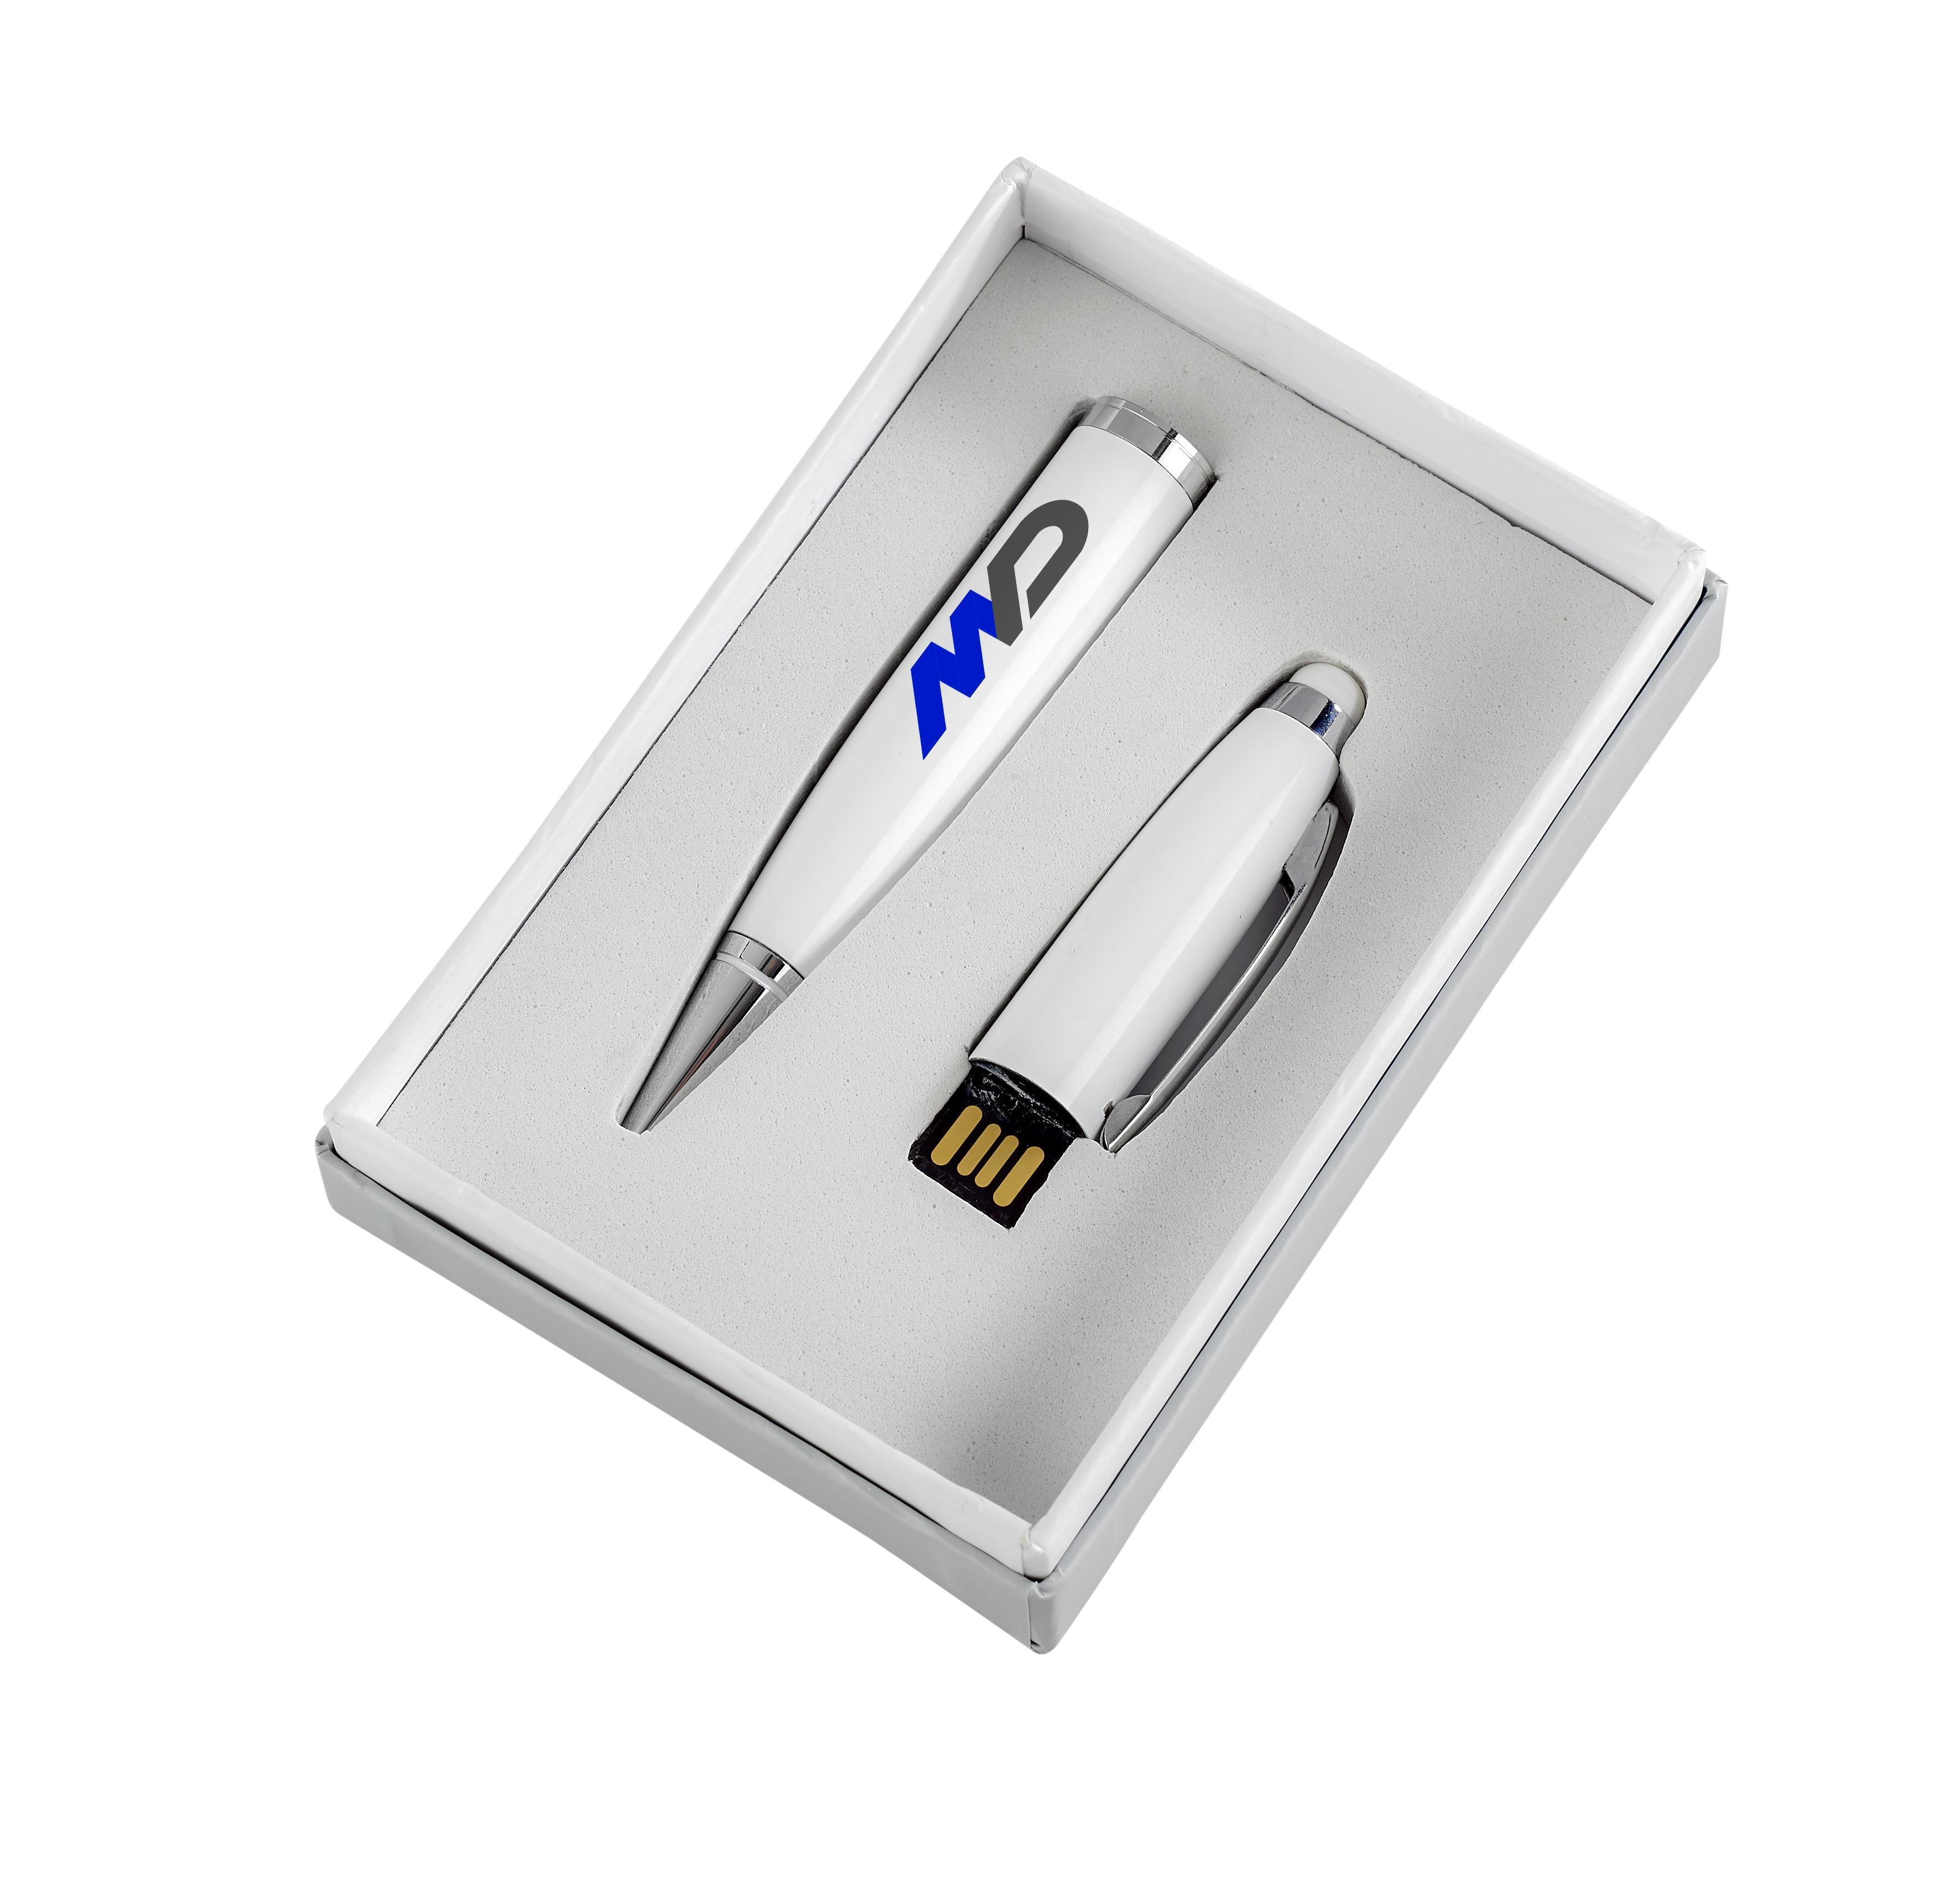 Pentagon White Usb Pen & Stylus - Solid White Only